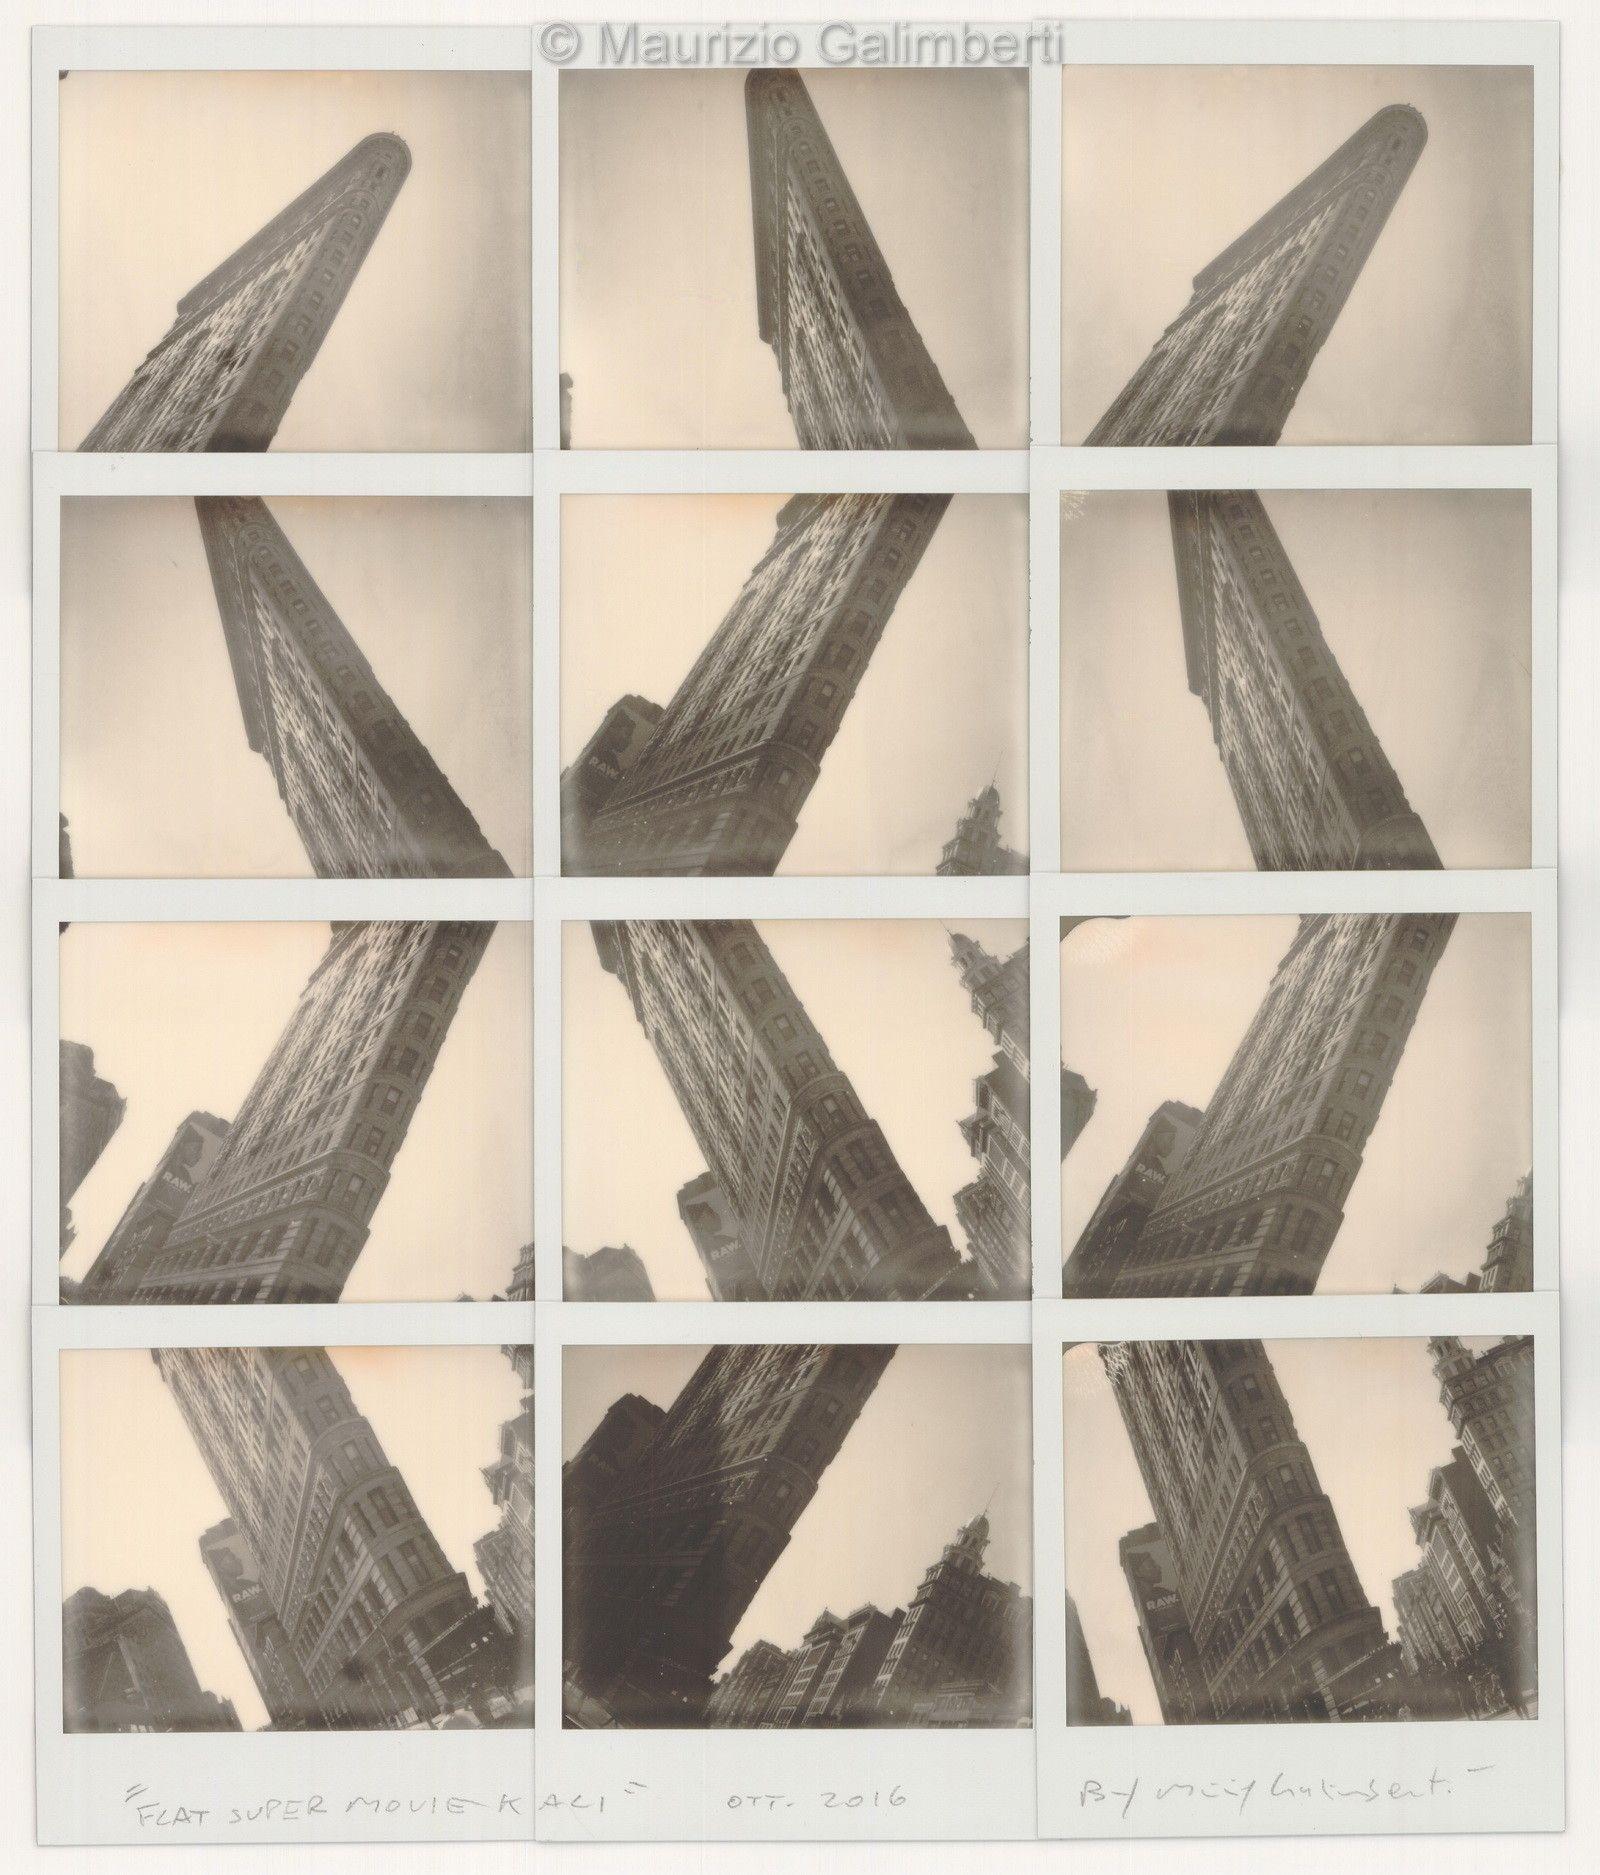 VINTAGE POLAROID MAURIZIO GALIMBERTI 'FLAT SUPER MOVIE KALI' dimensioni cm. 53x59